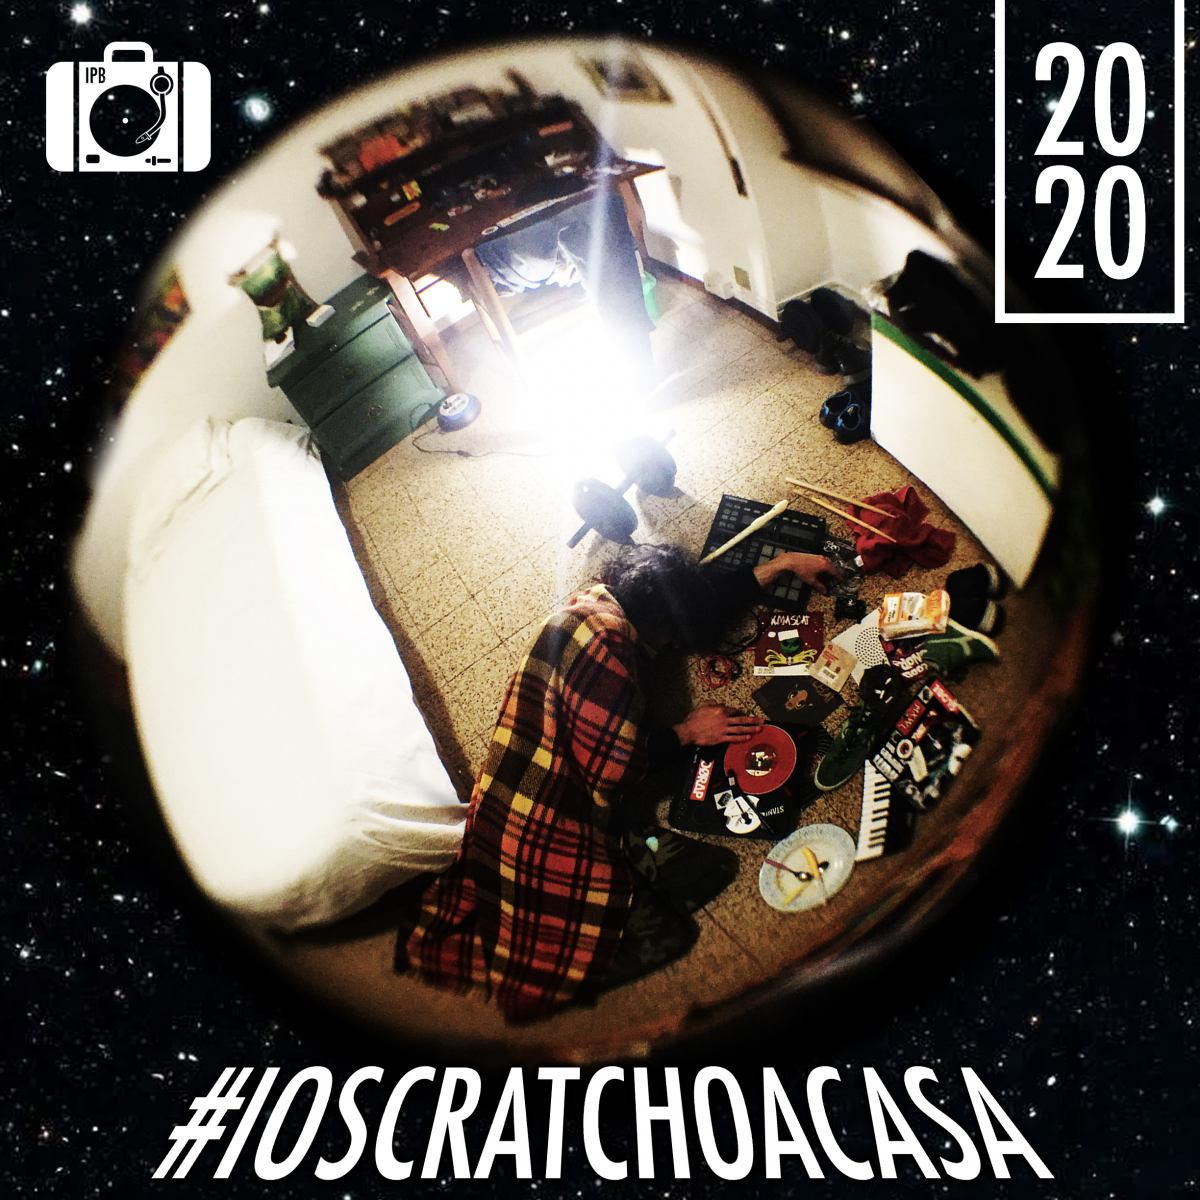 IPB lancia una nuova sfida: #ioscratchoacasa